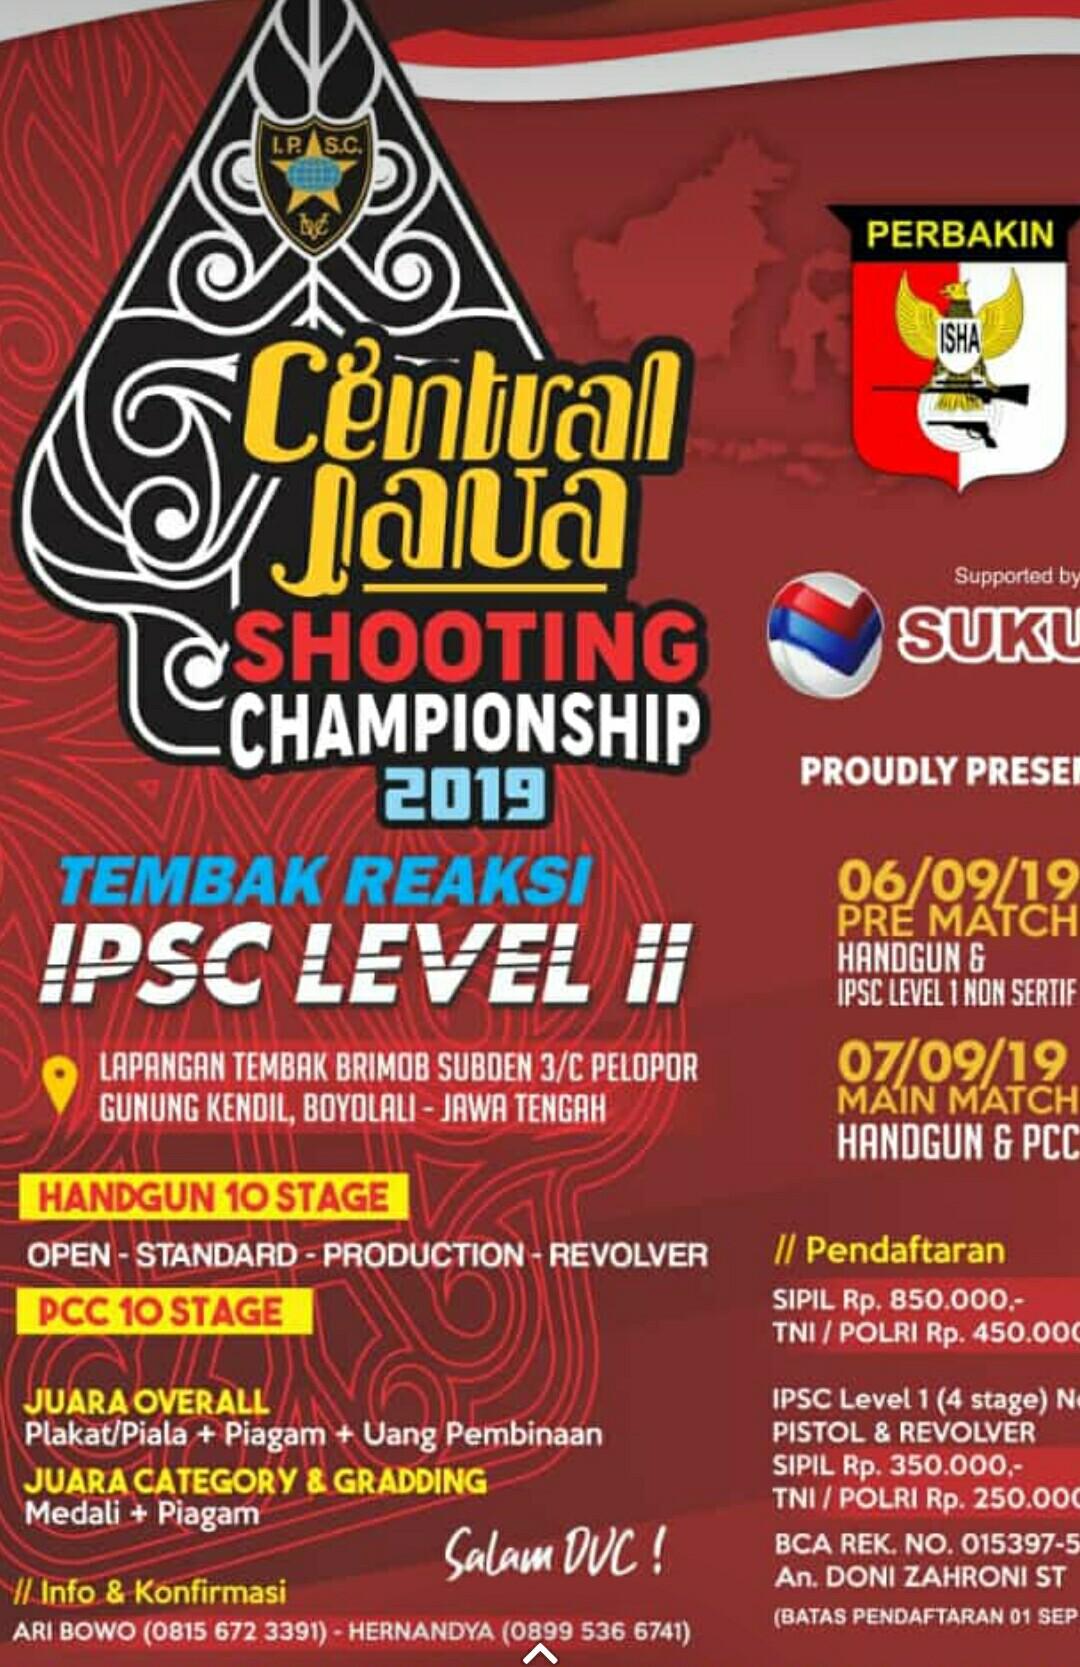 Central Java Shooting Championship 2019